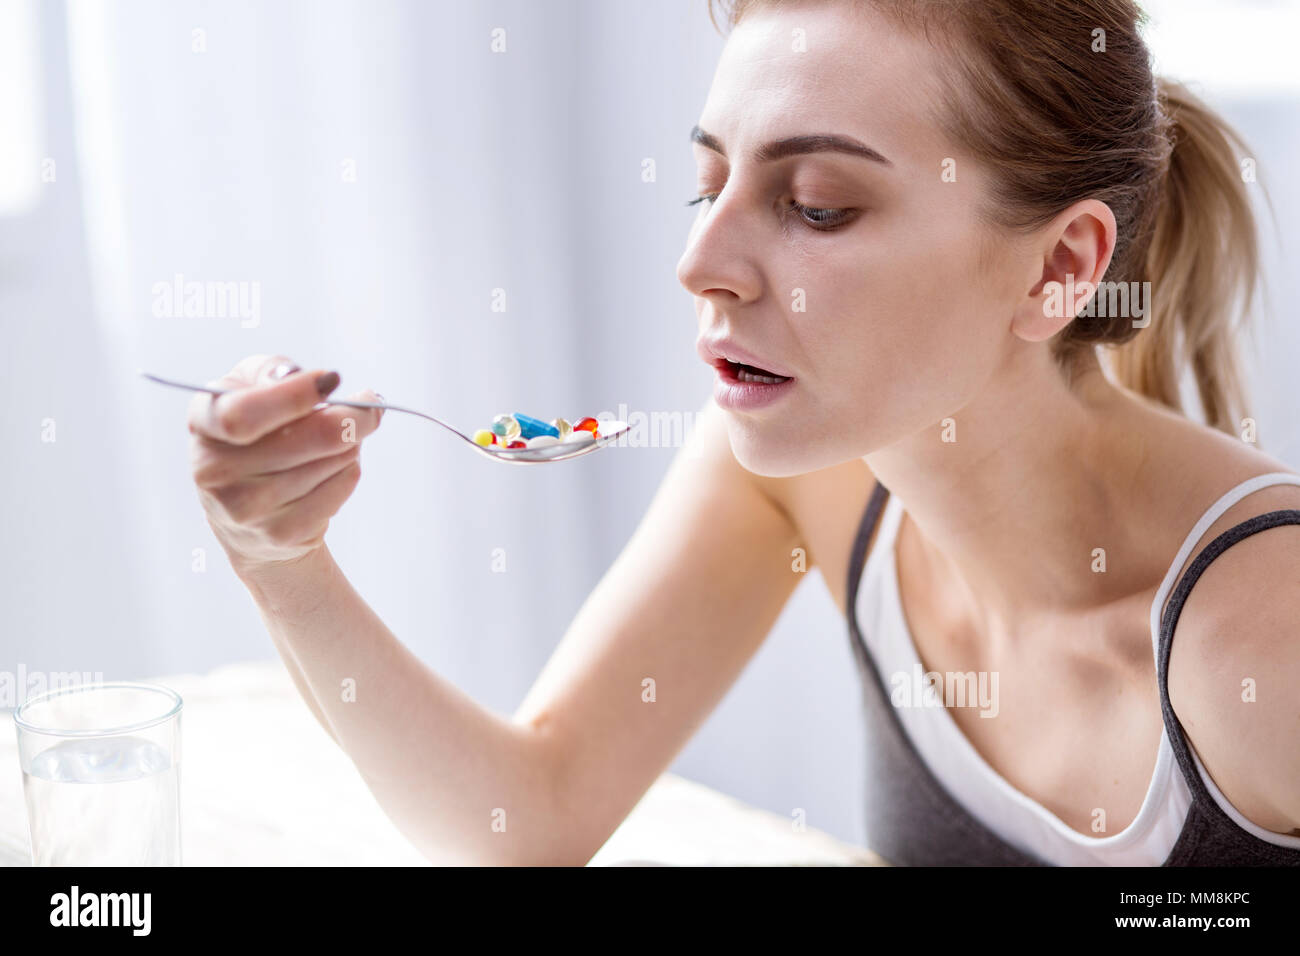 Sad young woman looking at the pills Photo Stock